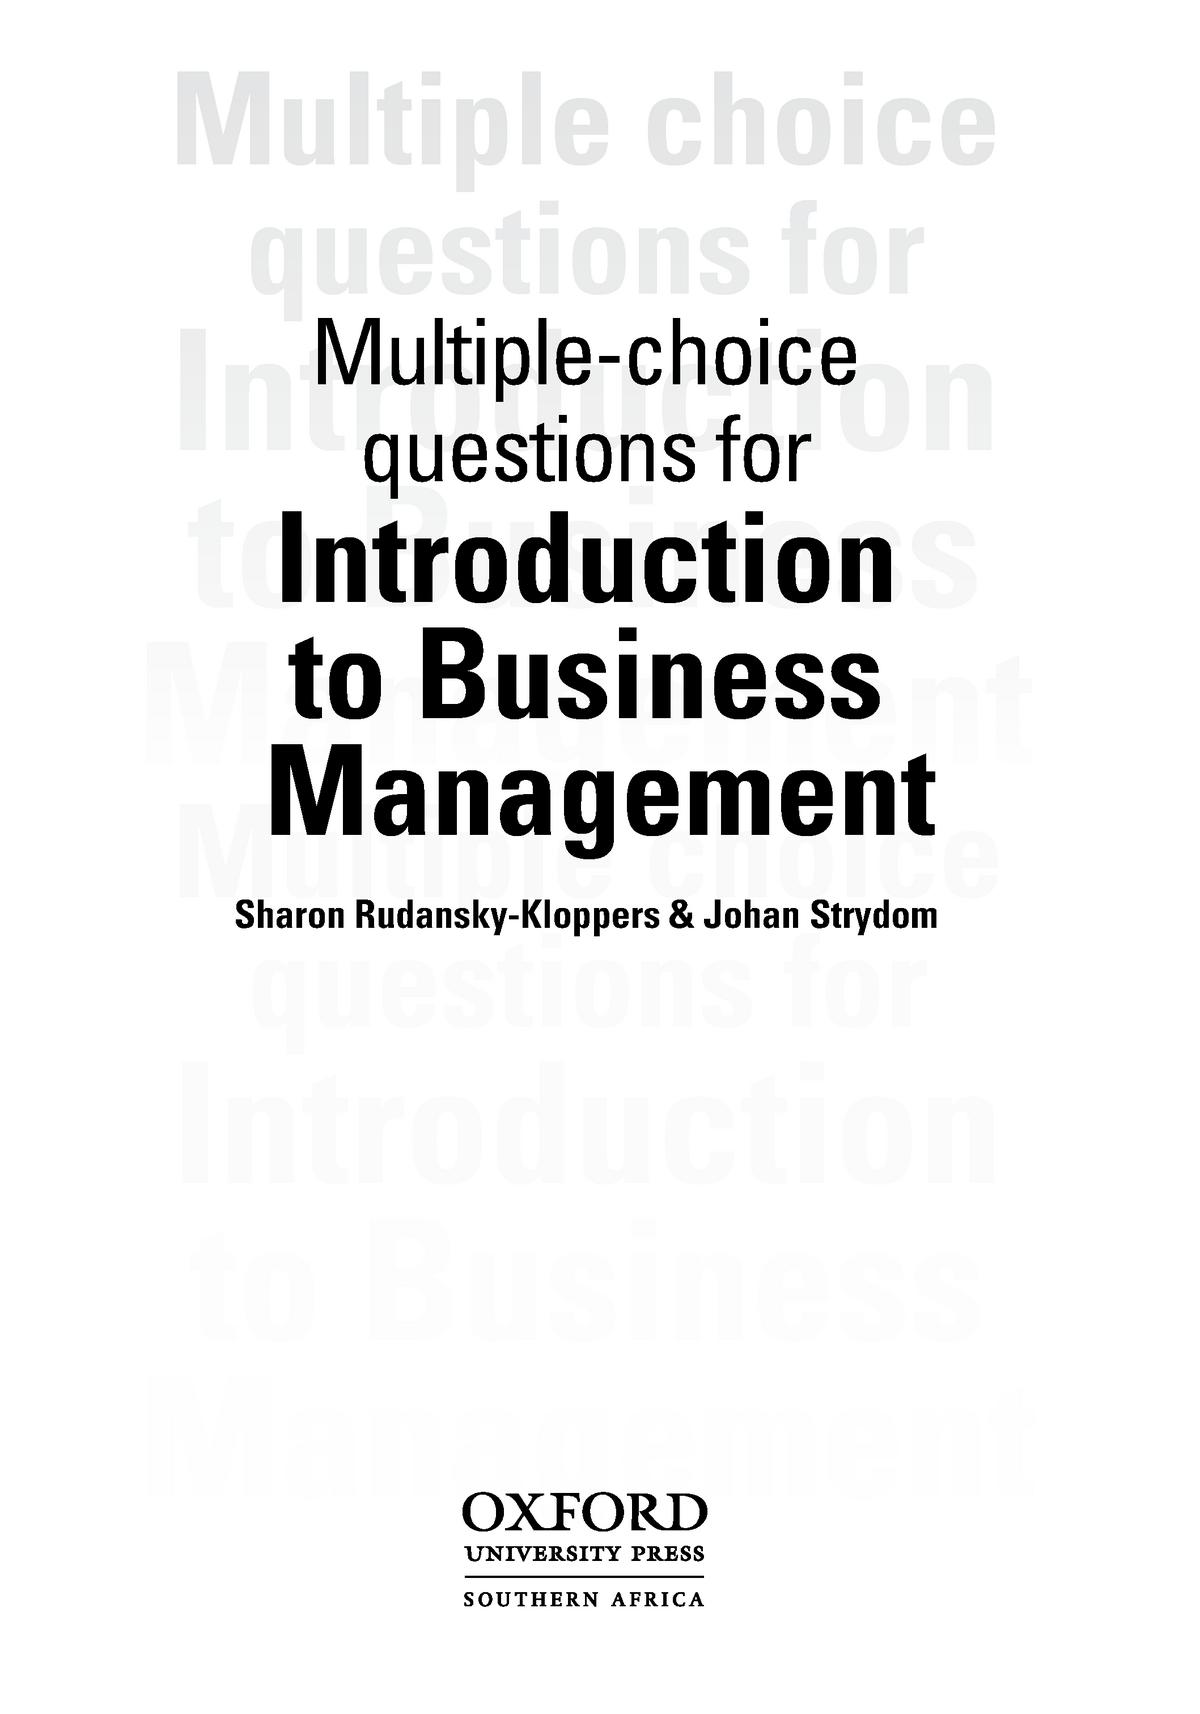 MNB1501-mcq book answers - MNB1601: Business Management IB - StuDocu